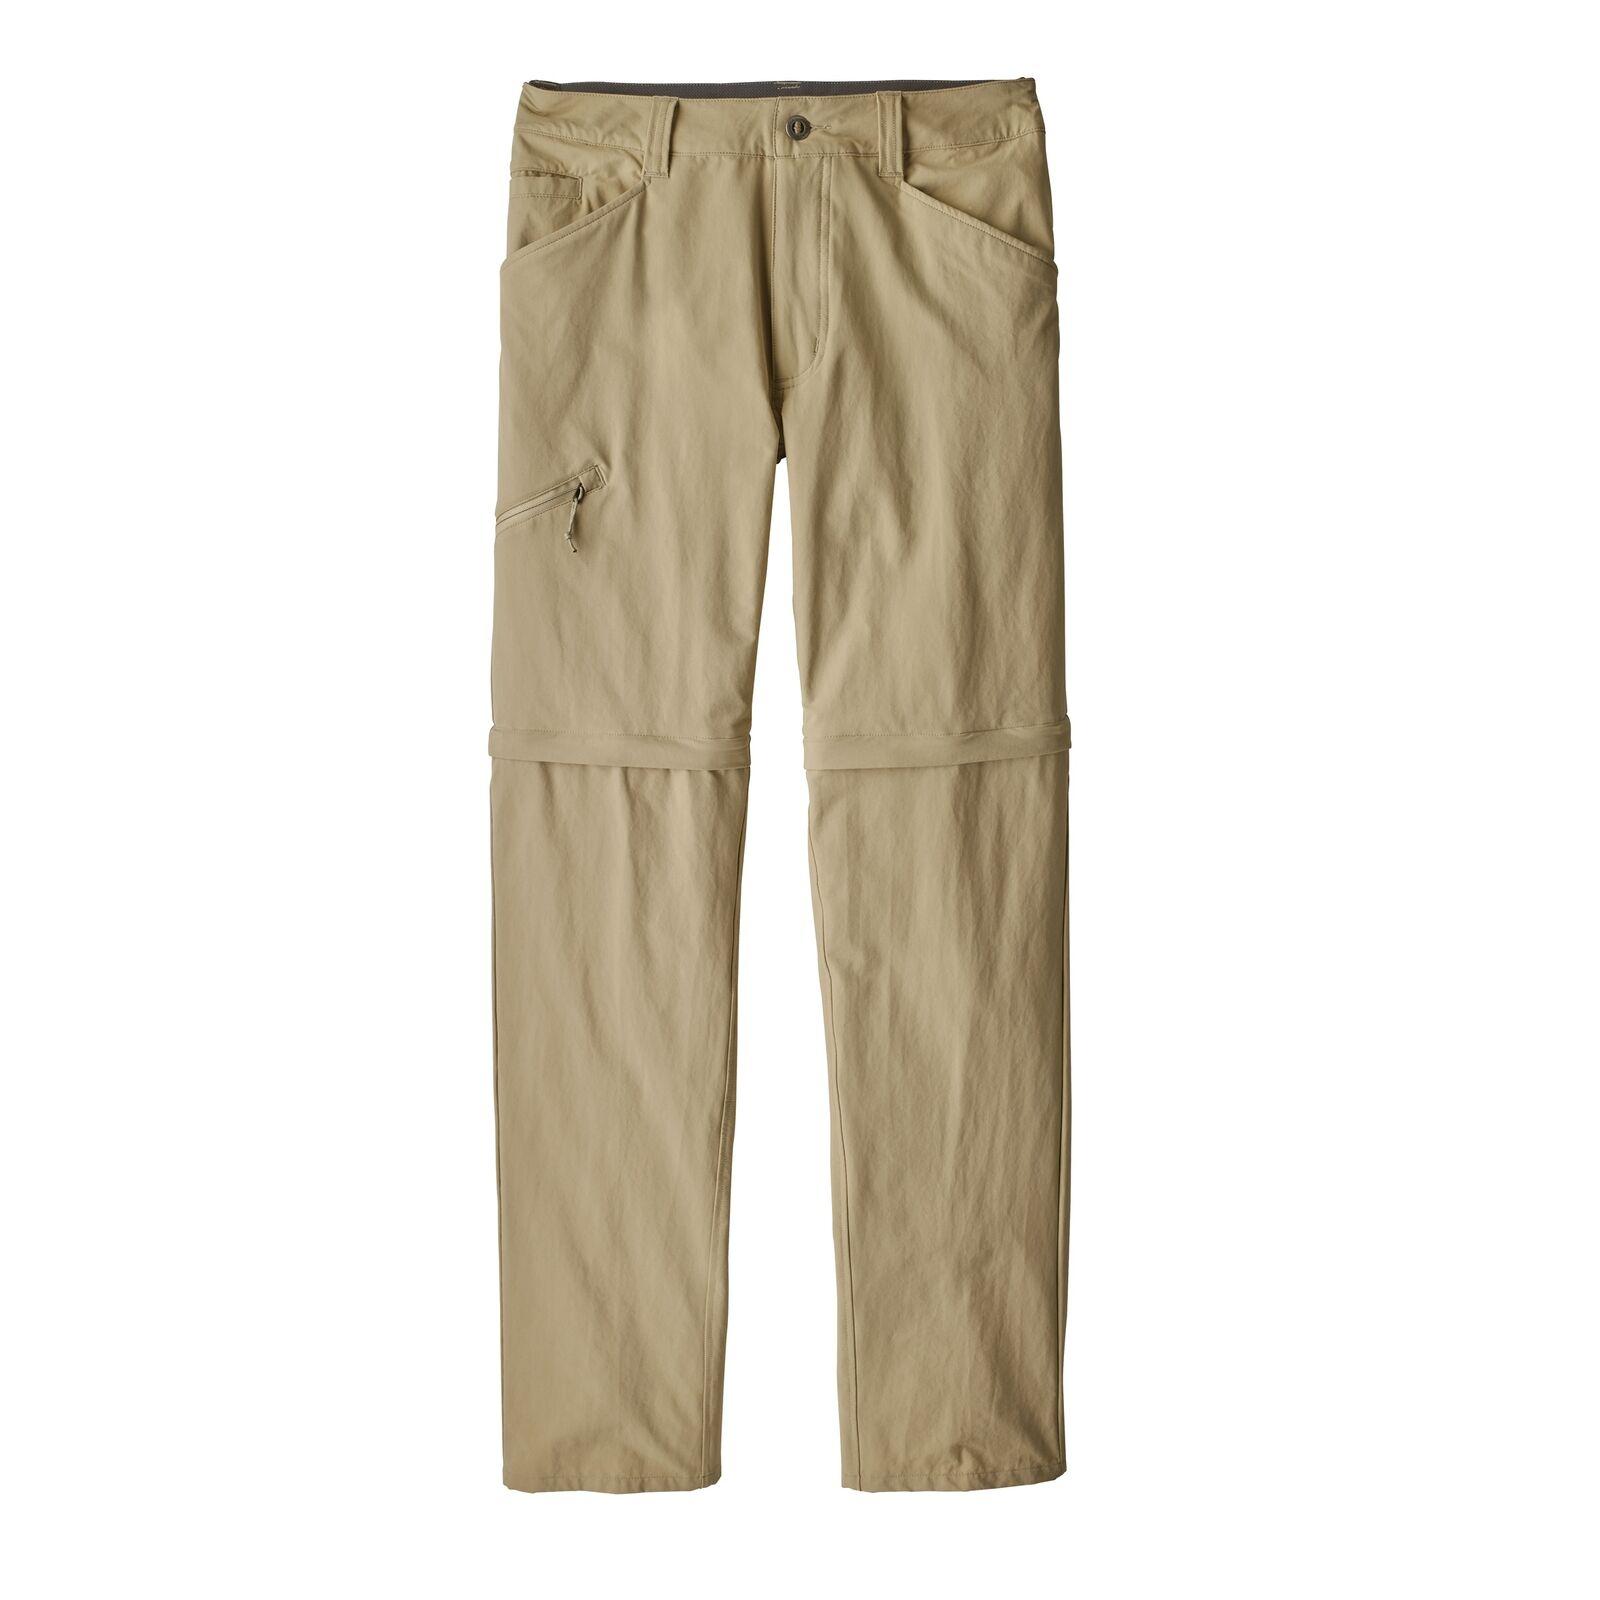 Patagonia Uomo ZipOffHose Queary Pantaloni da Trekre